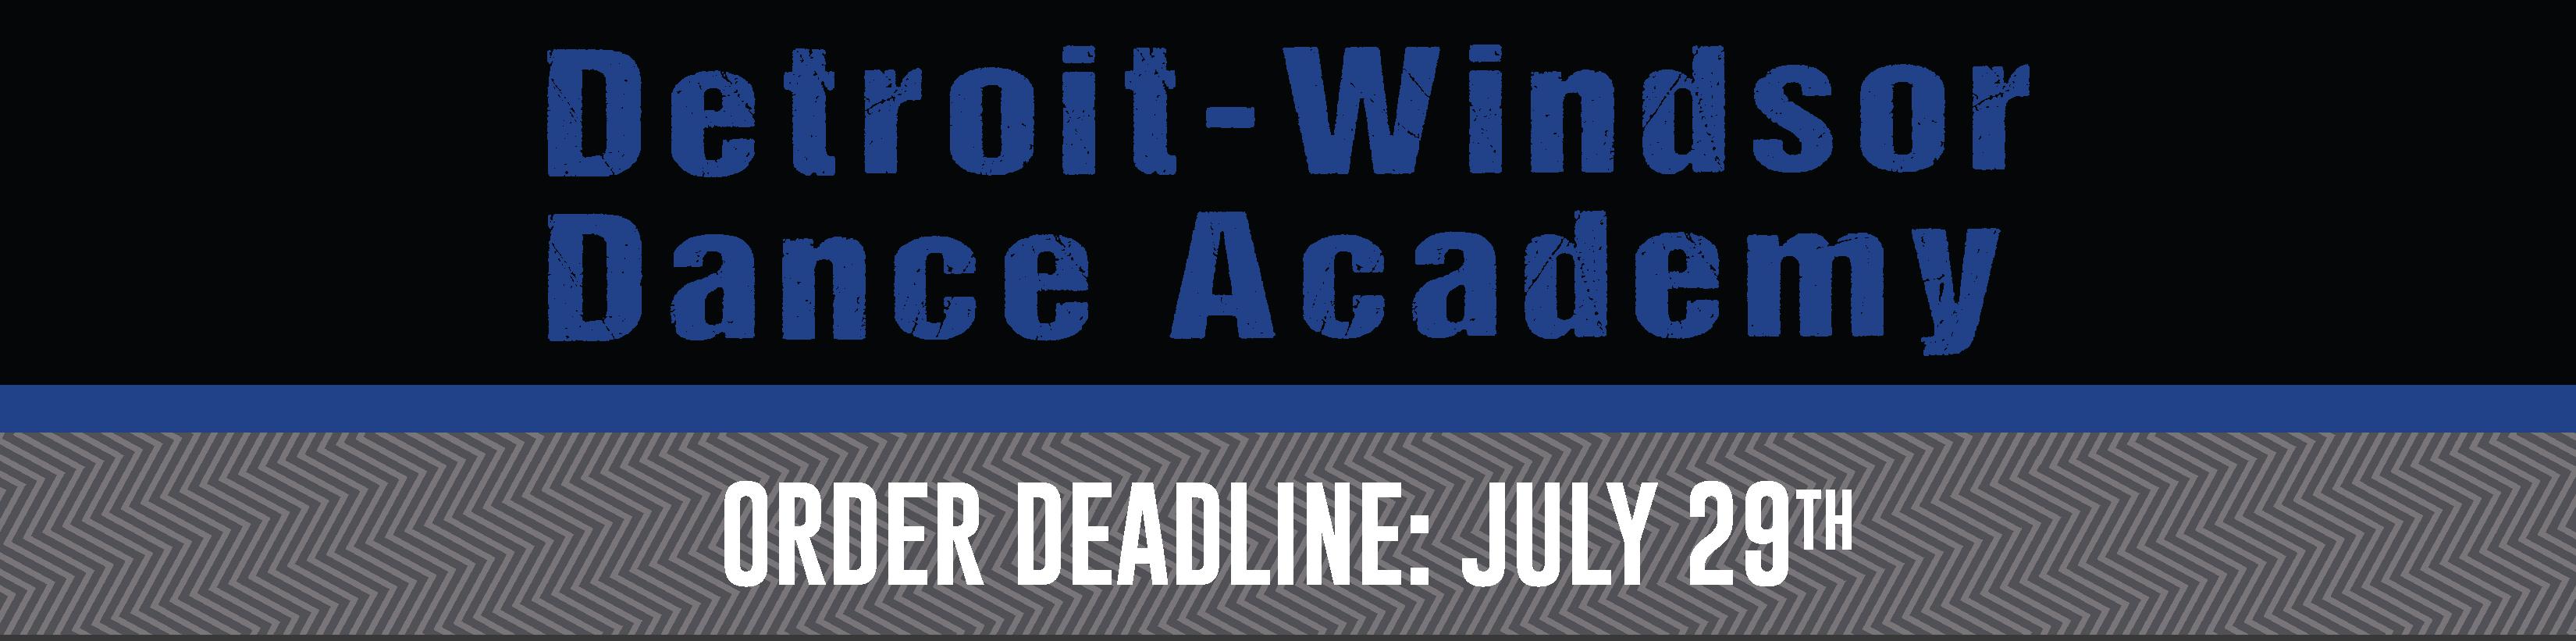 Detroit Windsor Dance Academy